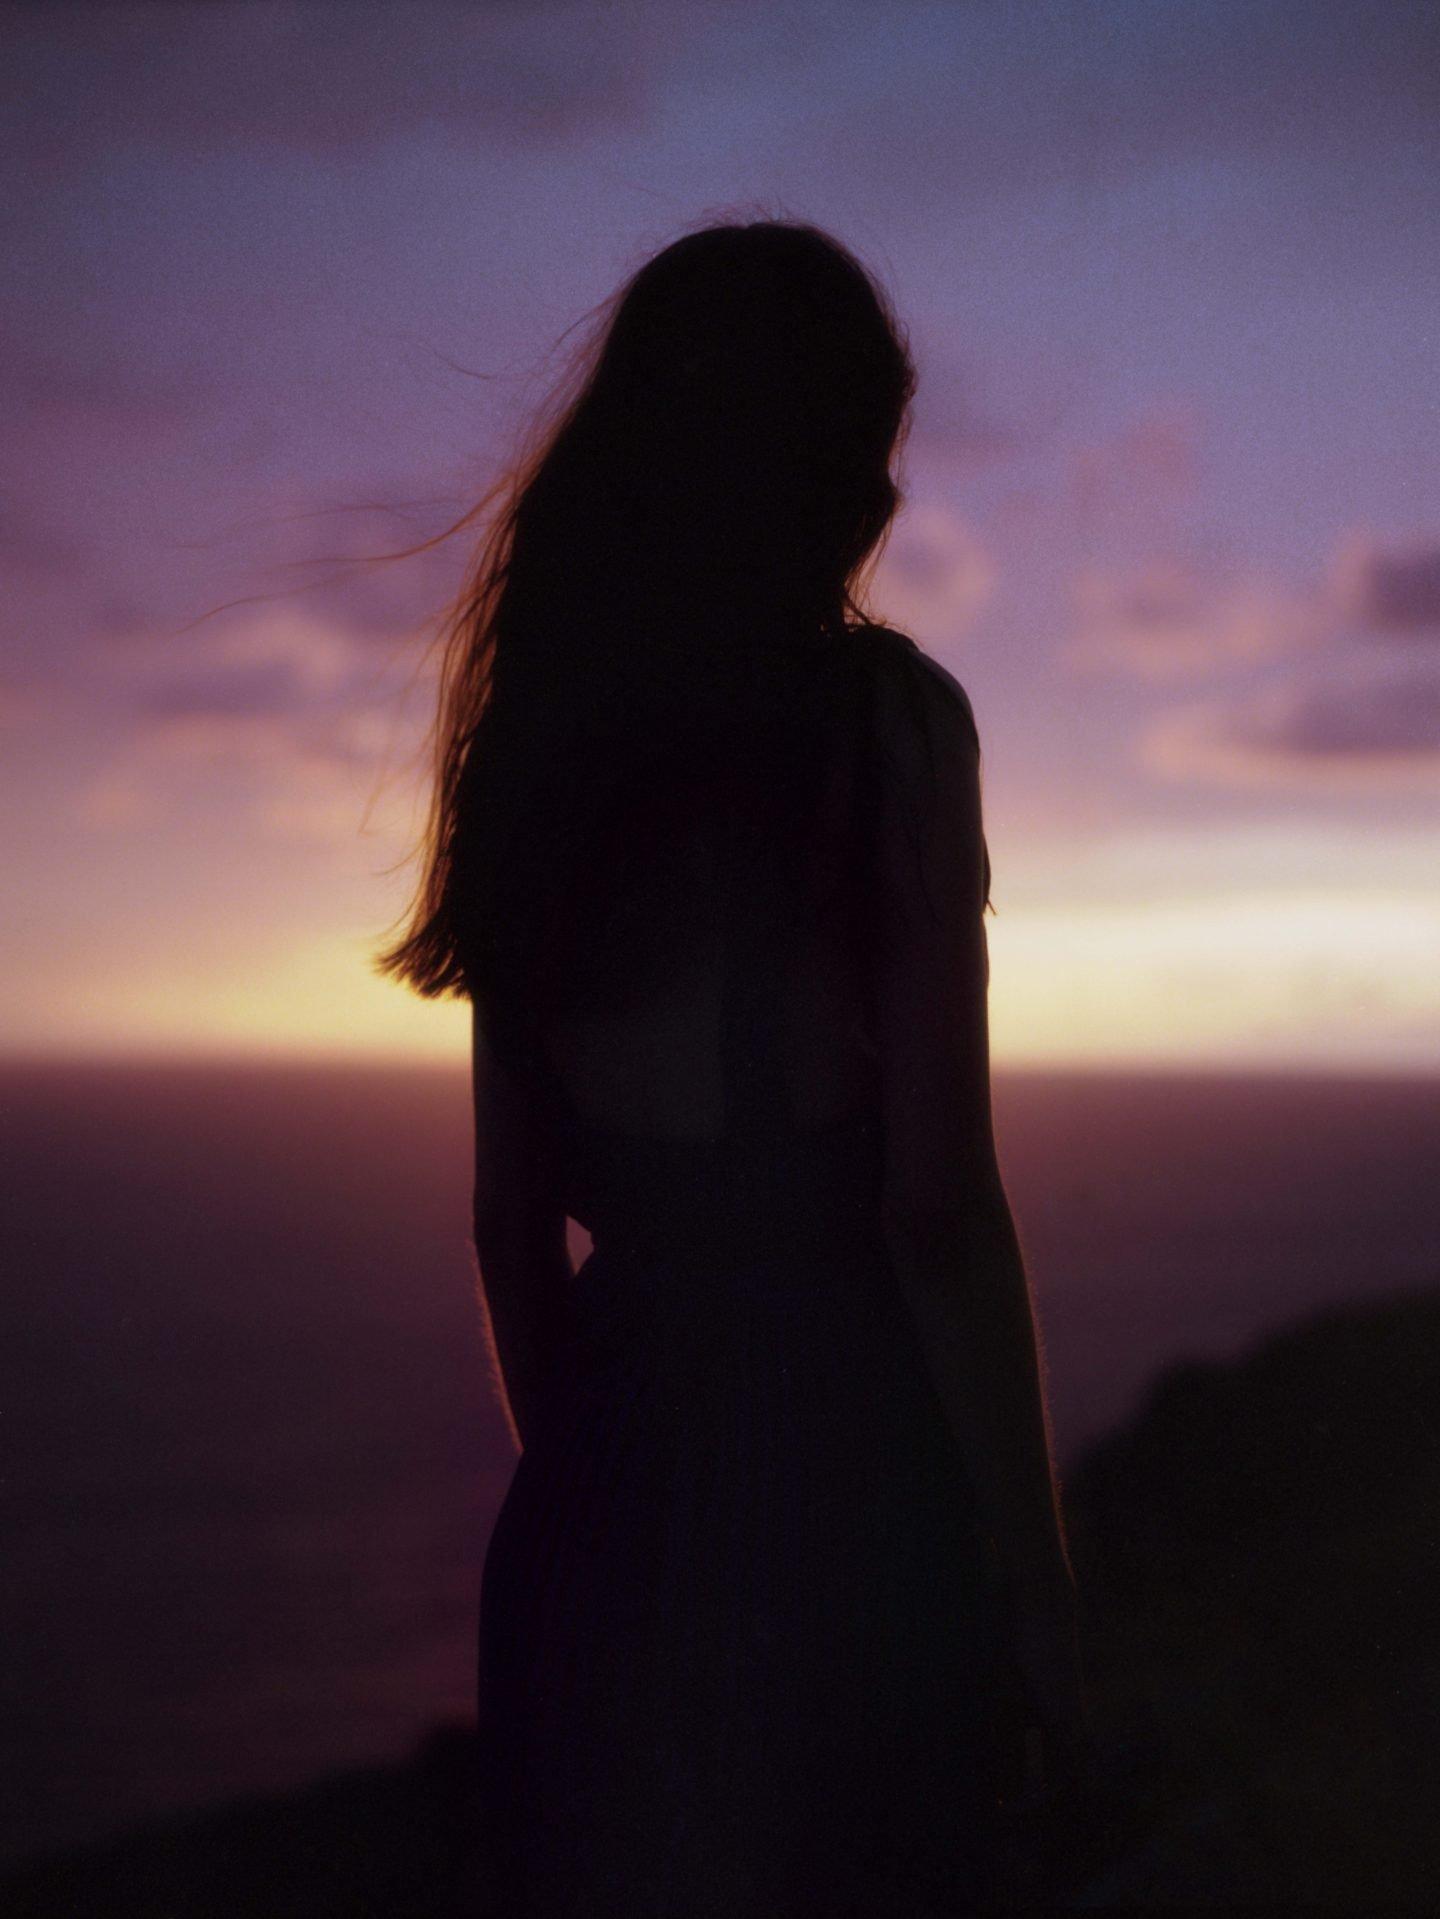 IGNANT-Photography-Jacques-Brun-Sunset-Garden-011